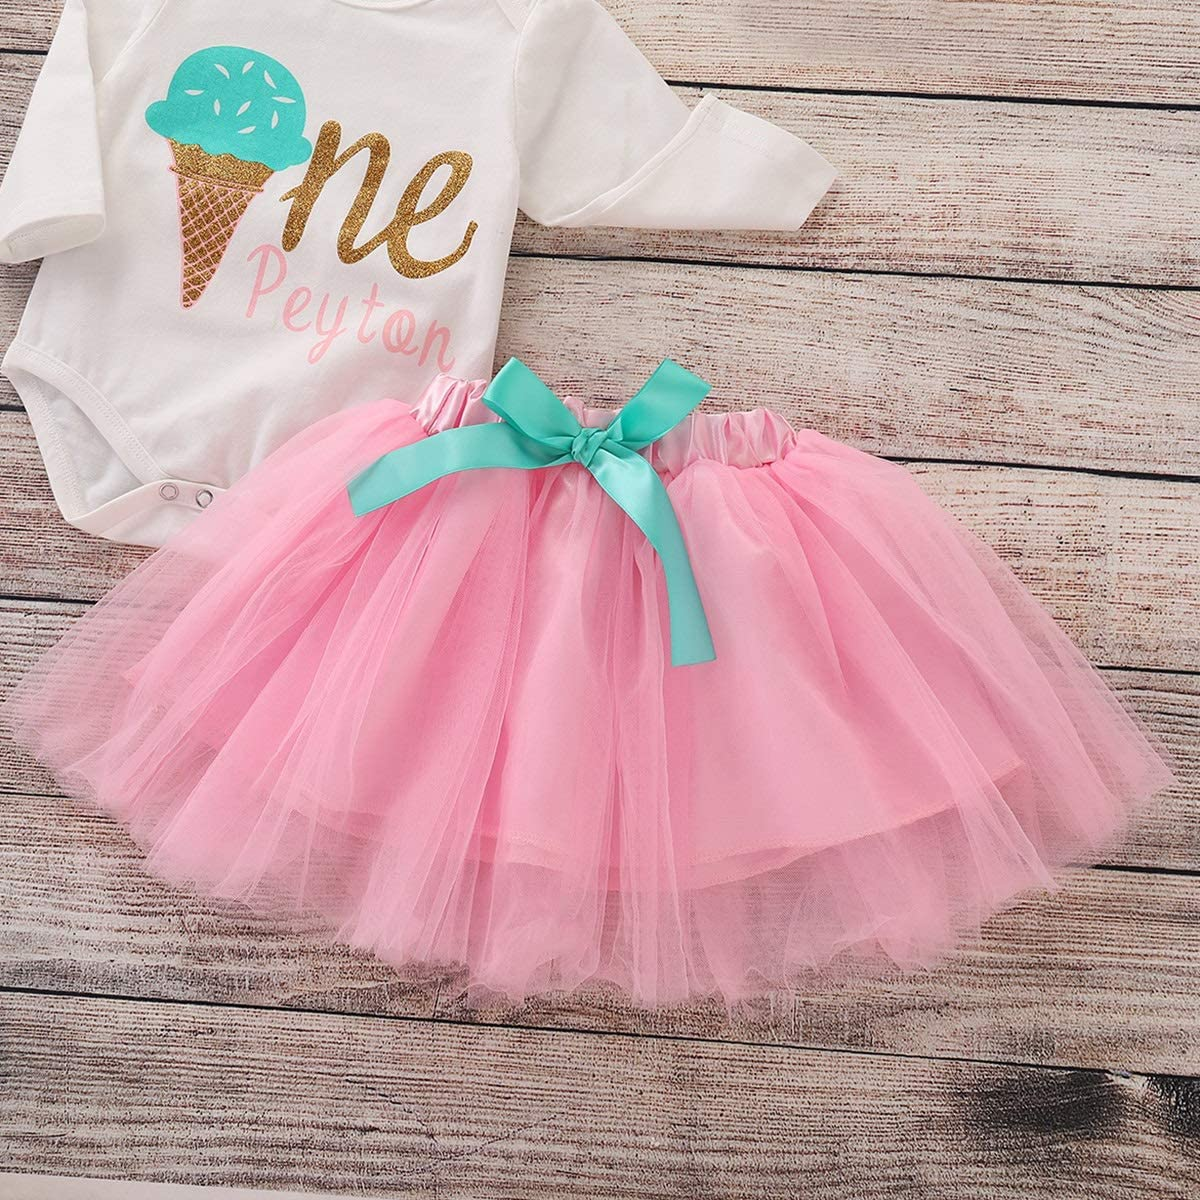 puseky 3pcs//Set Baby Girls Clothes Long Sleeve Ice Cream Romper+Mesh Tutu Skirt+Flower Headband Sunsuit Outfits Set